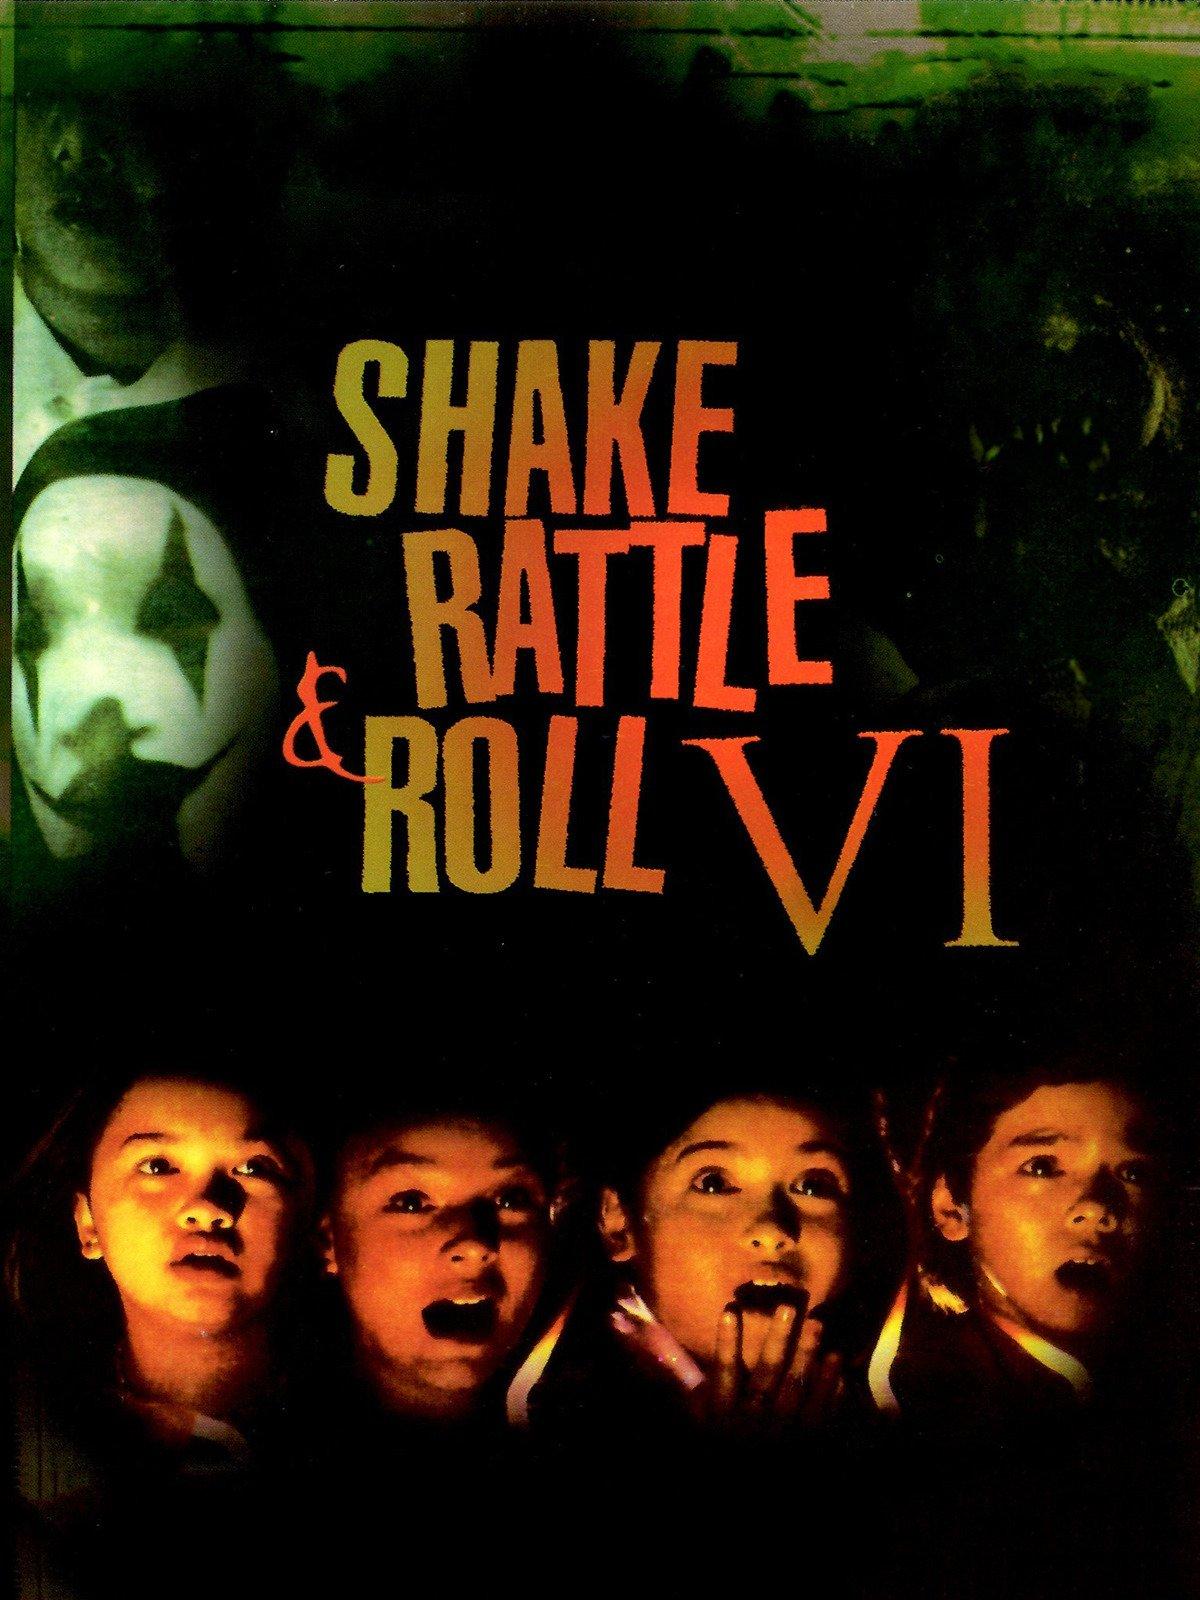 Shake Rattle & Roll VI